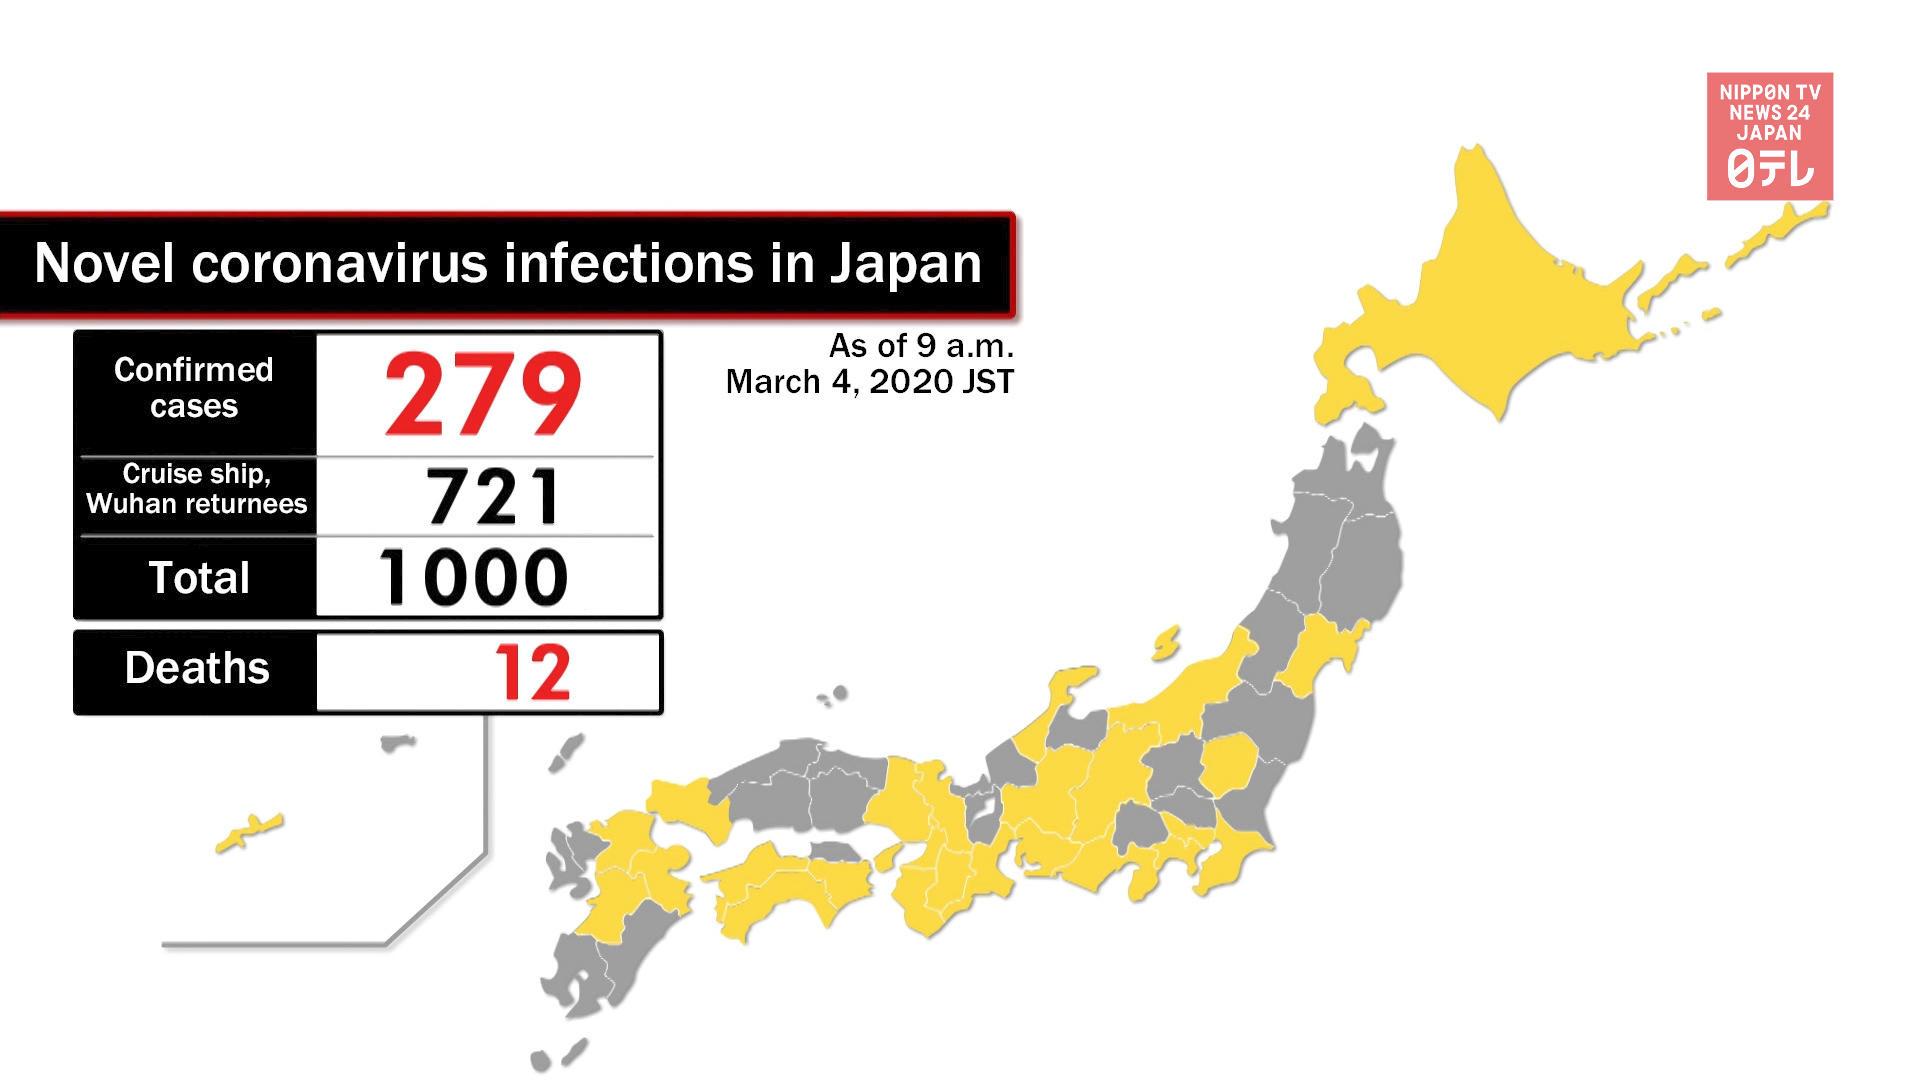 Coronavirus cases in Japan reach 1,000